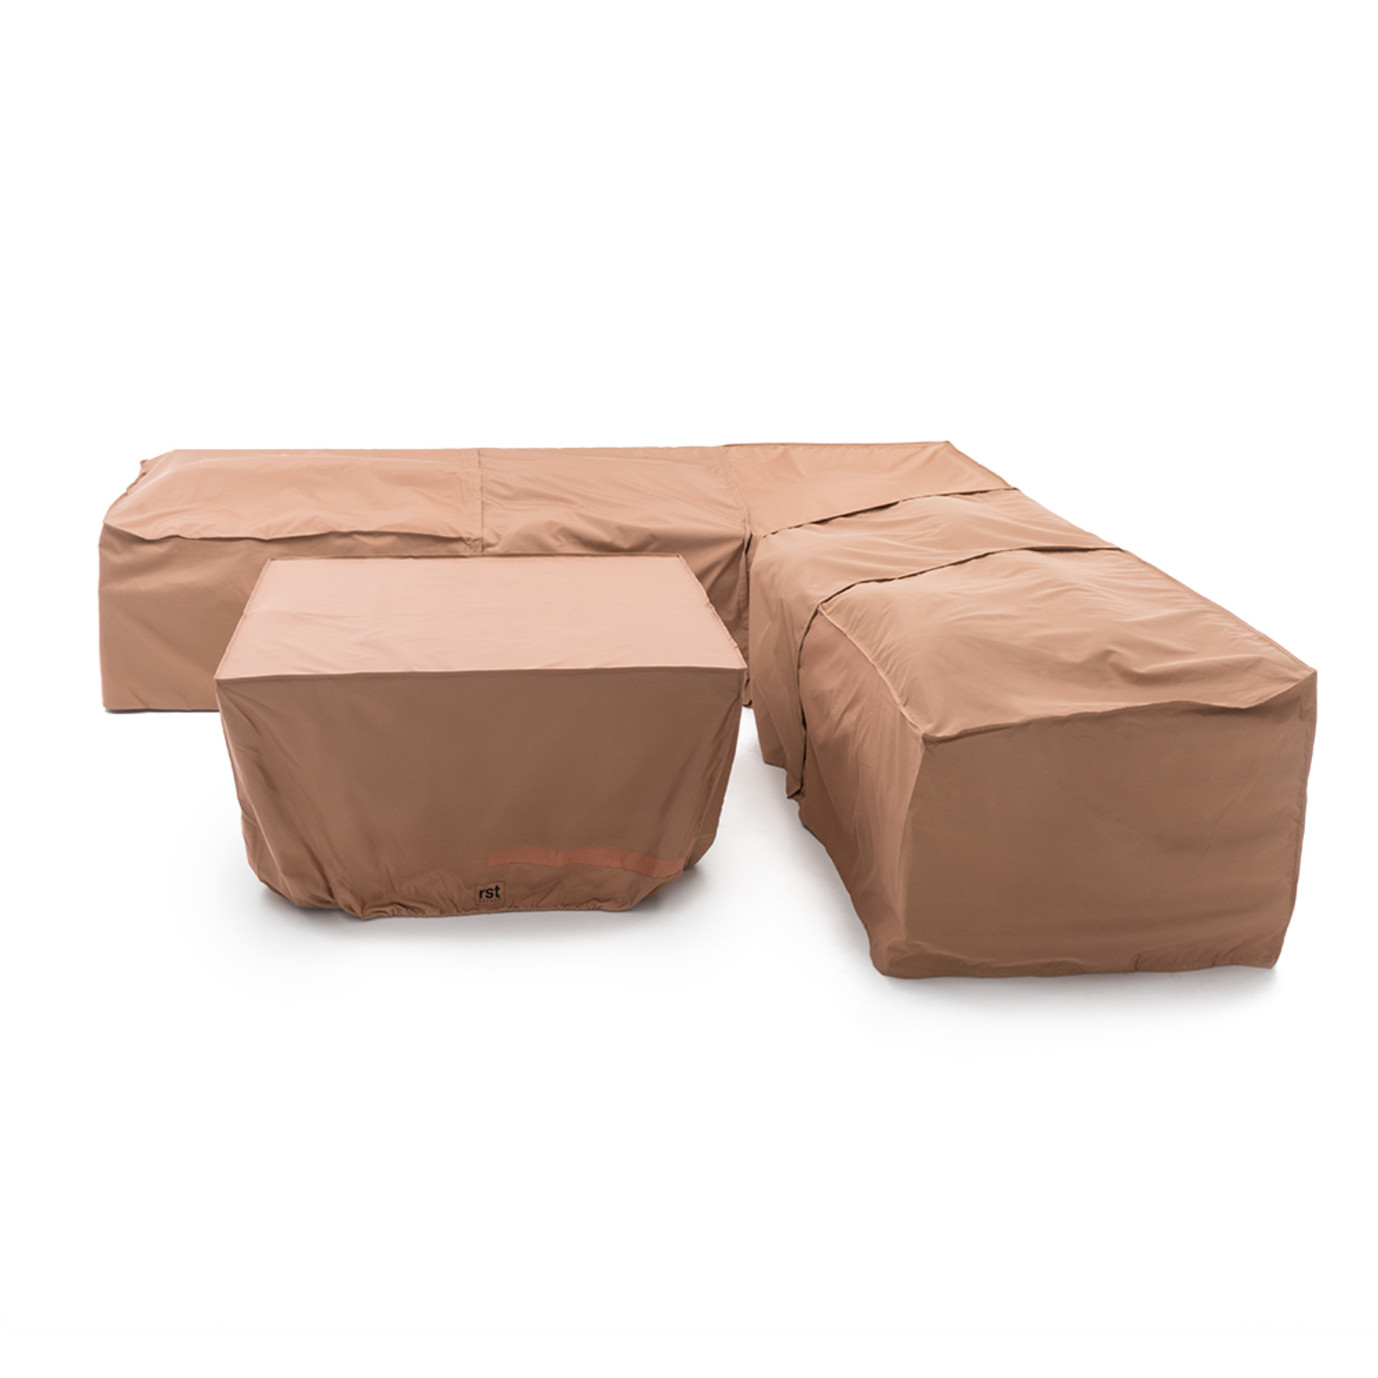 Portofino™ Zipper Furniture Covers for 6pc Fire Sectional